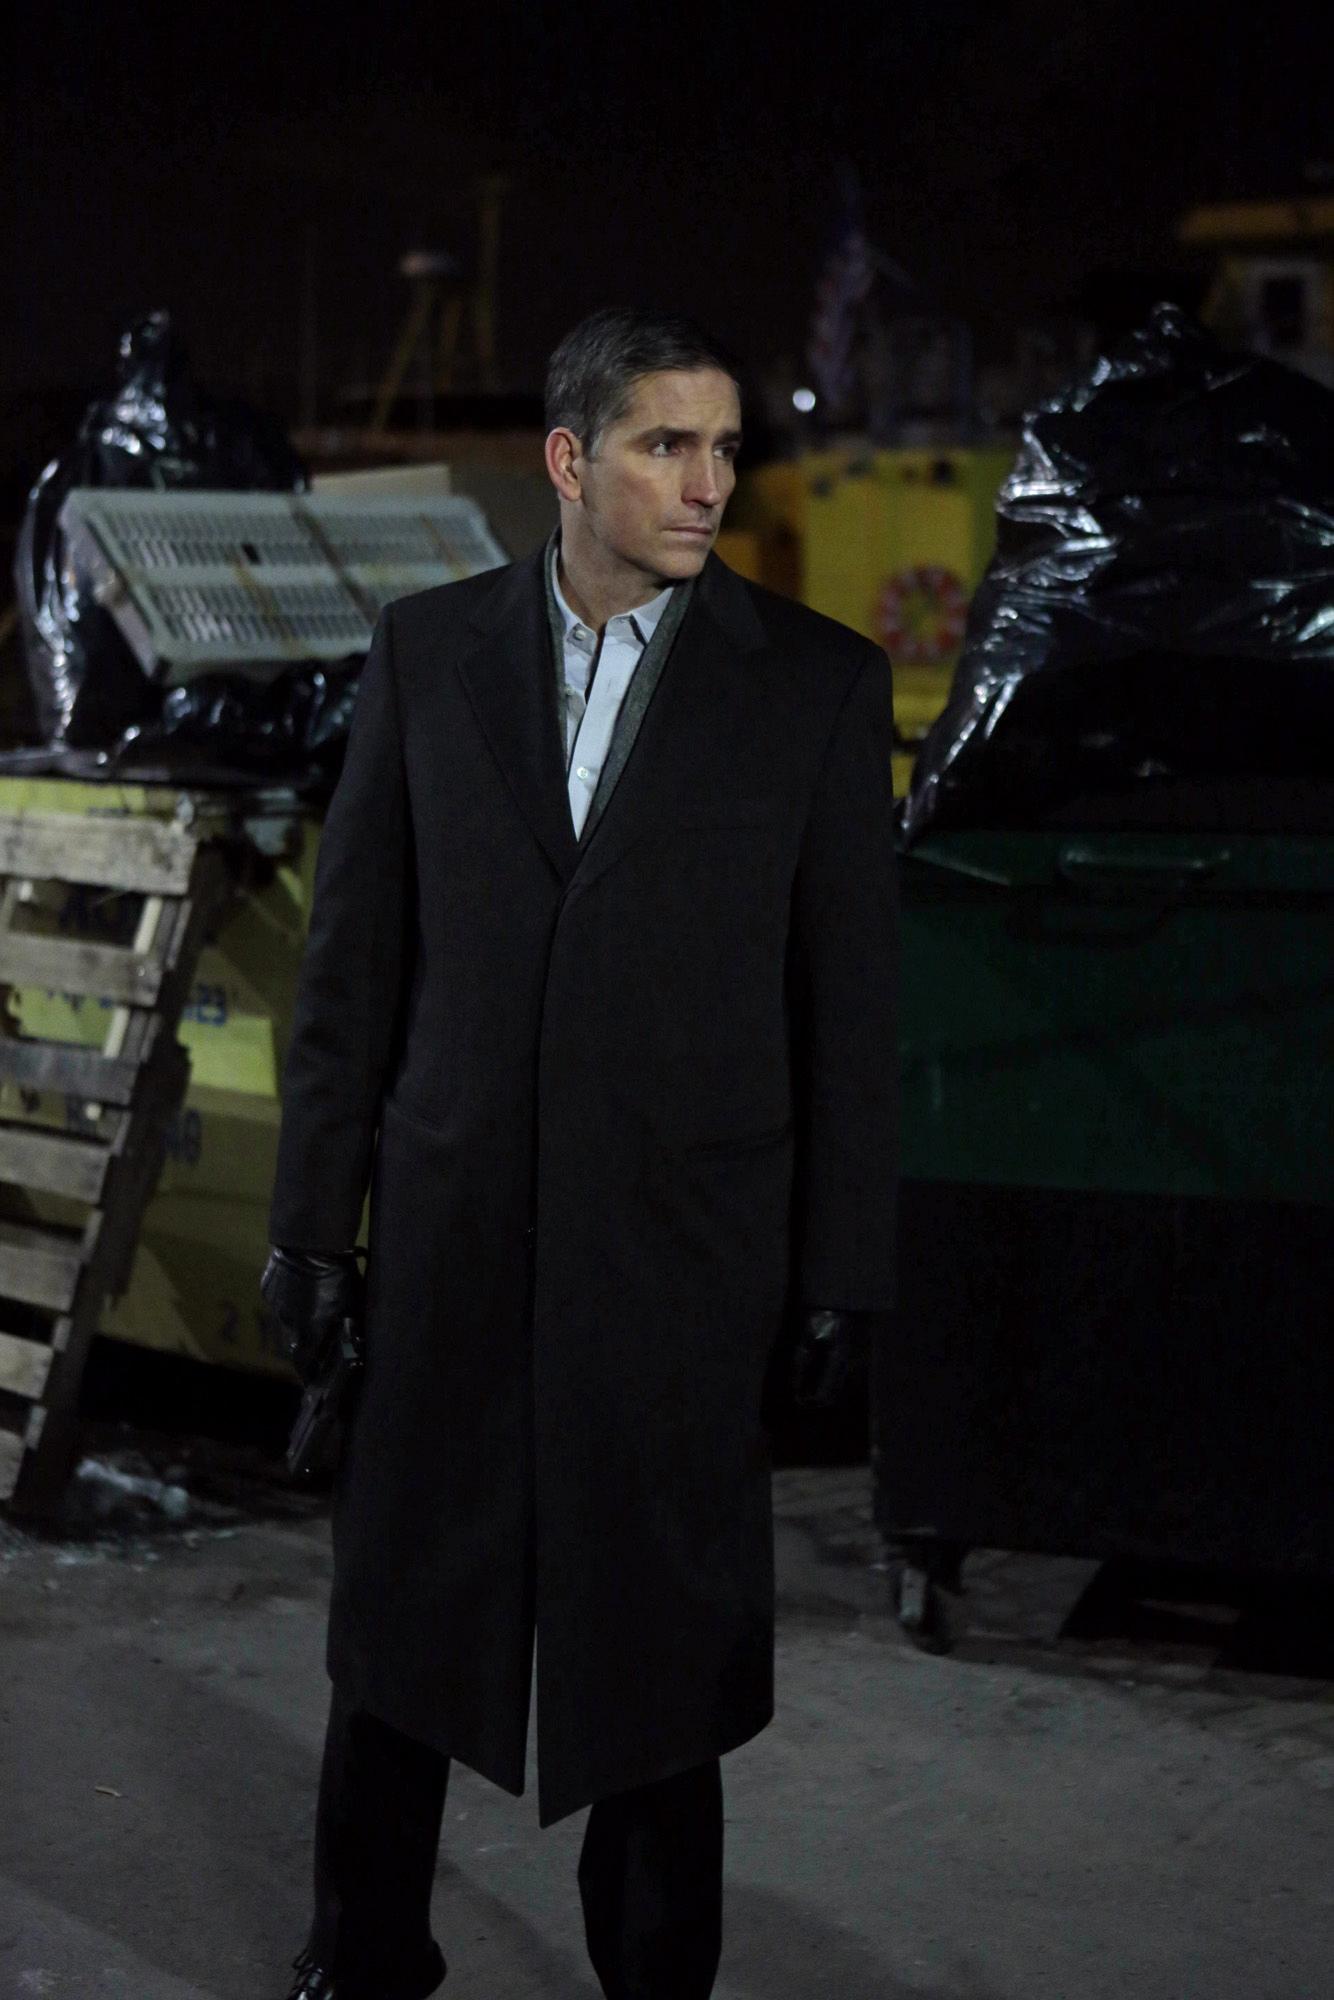 Season 3 Episode 16 - Person of Interest - CBS.com